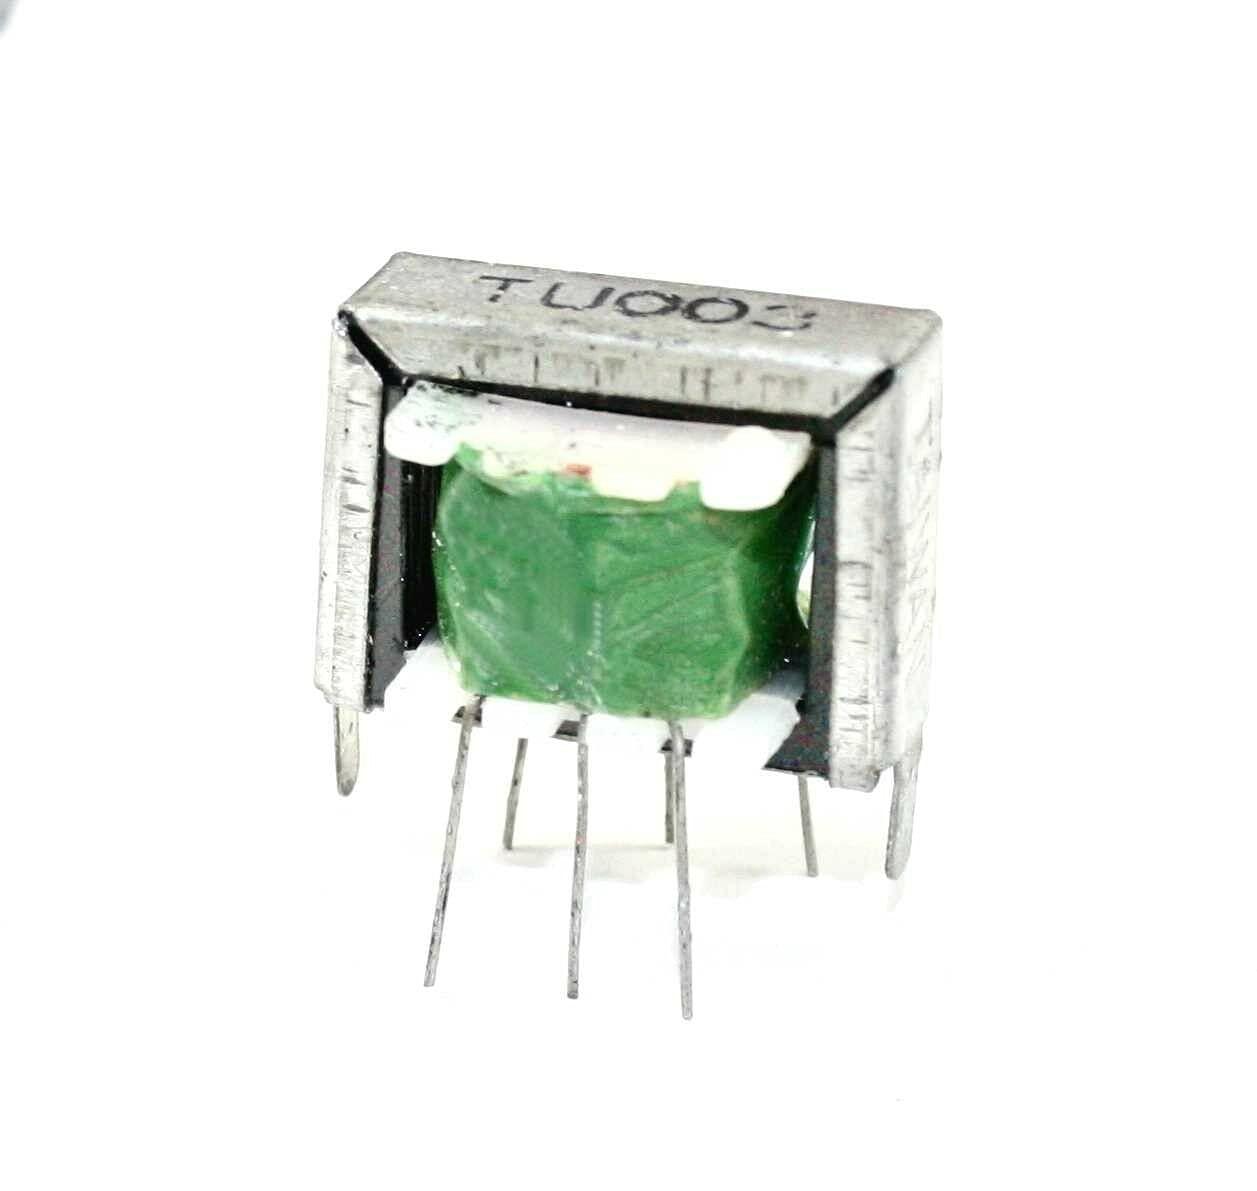 5 Pcs of Audio PC Mount Transformer 42TU003